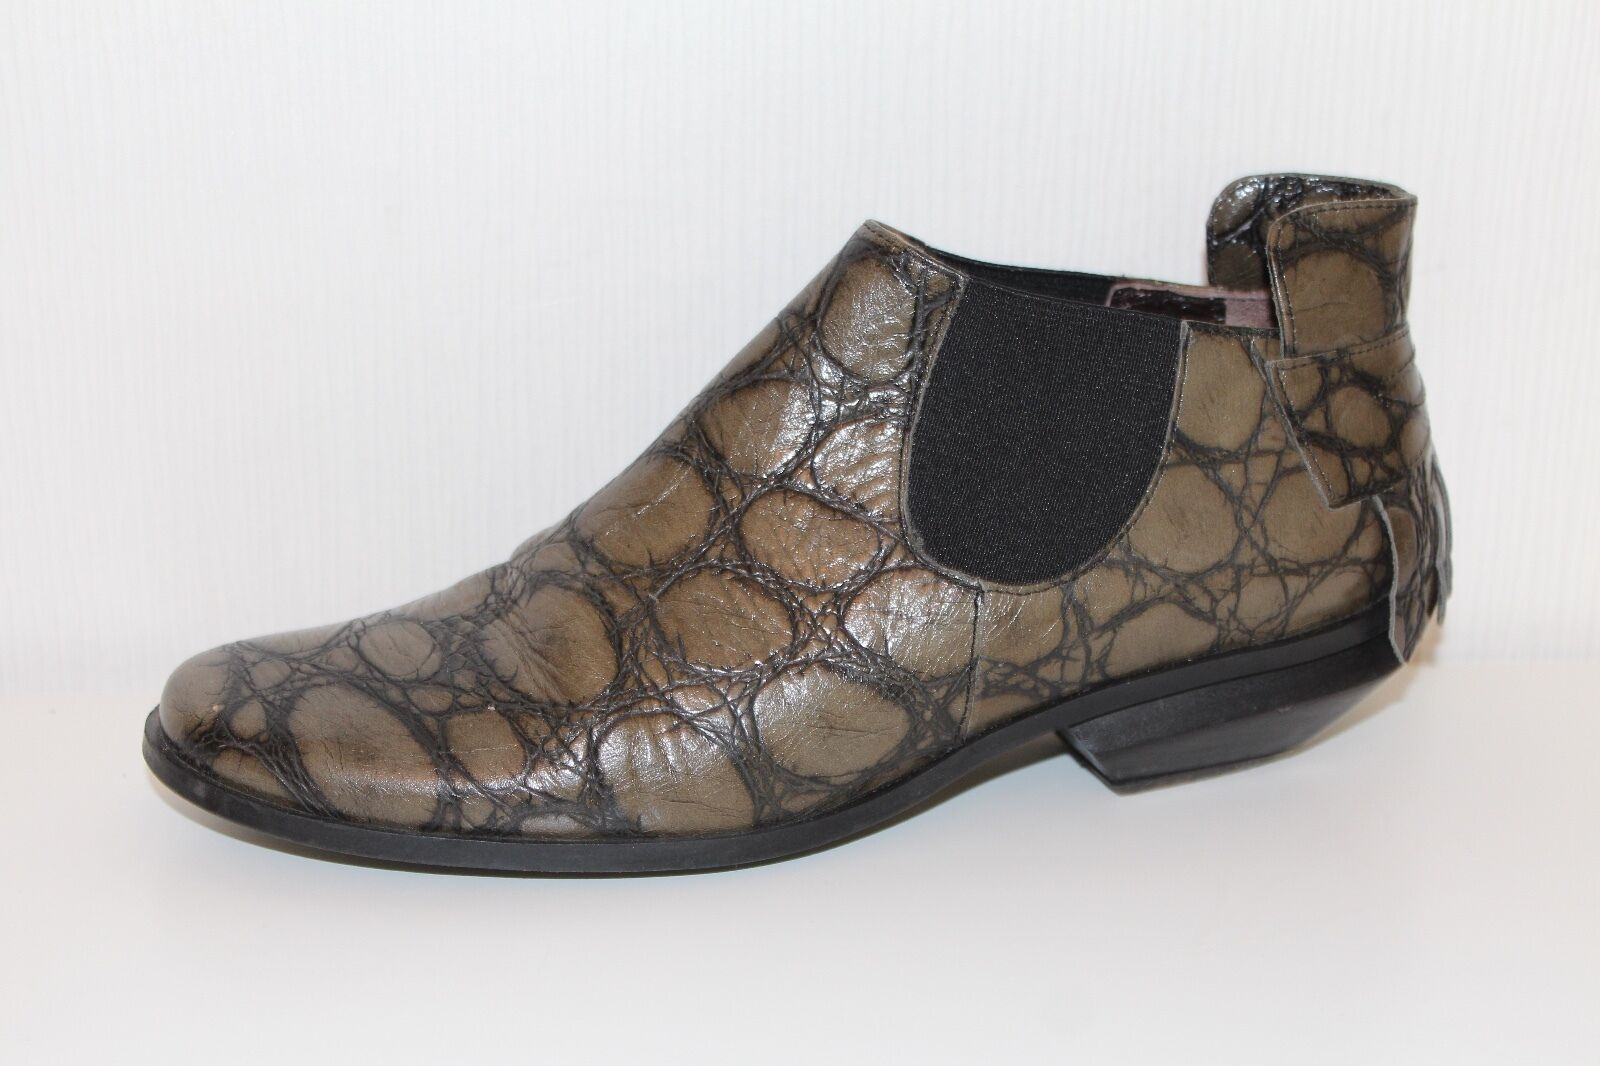 LISA TUCCI ECHTLEDER STIEFELETTEN Stiefel Leder Ankle Stiefel STIEFELETTEN 37 BOOTIES Schuhe Designer fdd7ae